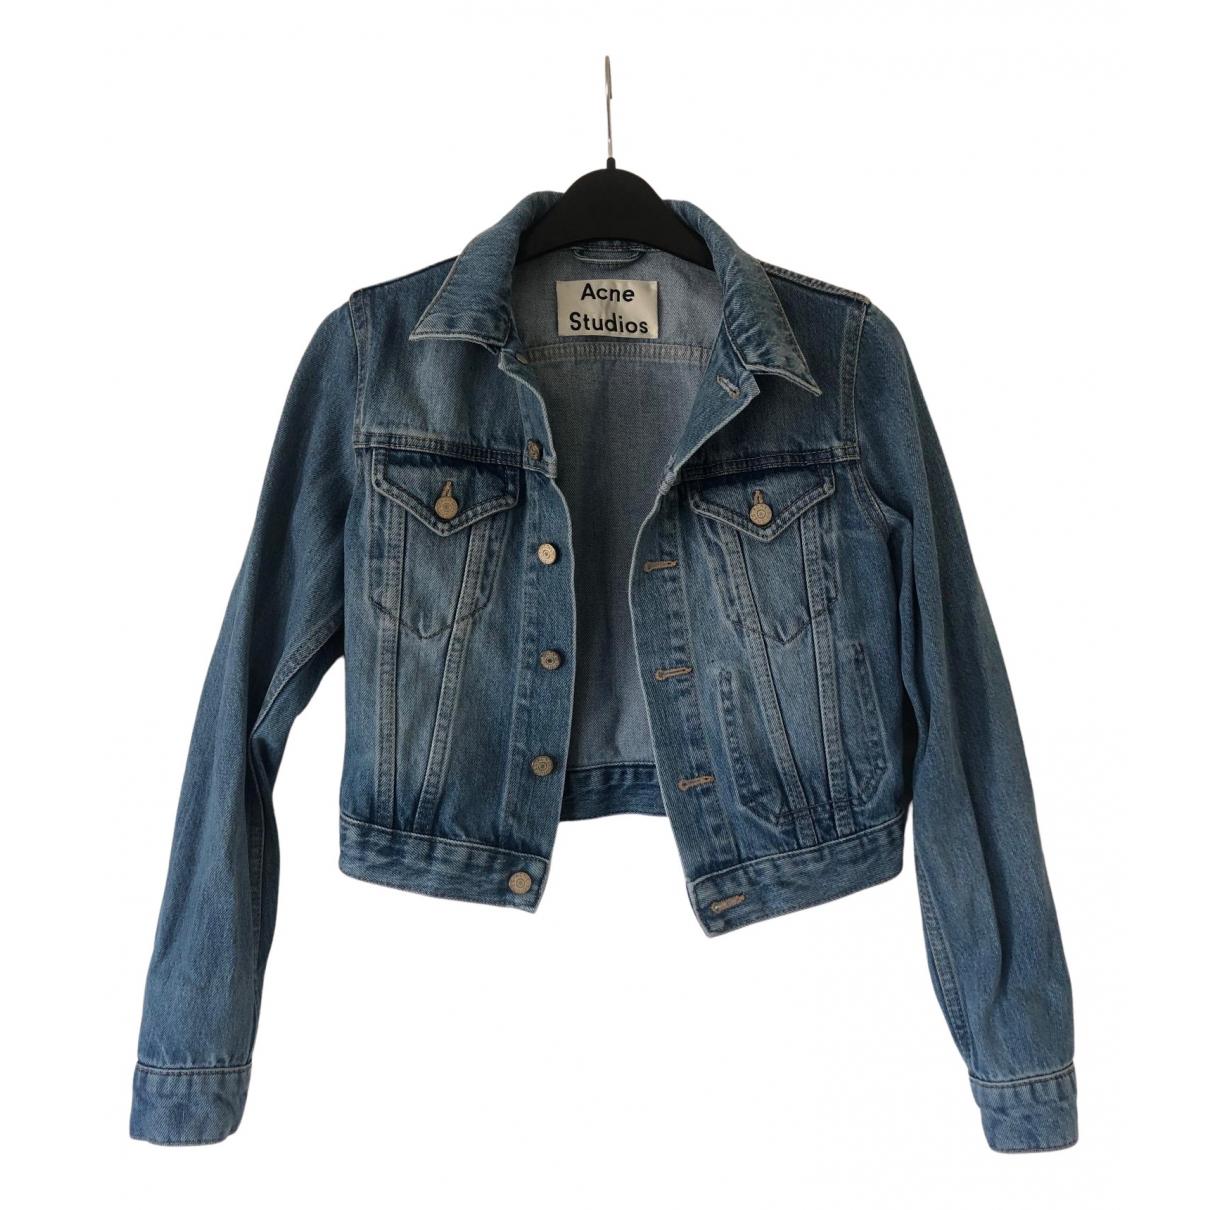 Acne Studios N Blue Denim - Jeans jacket for Women 32 FR